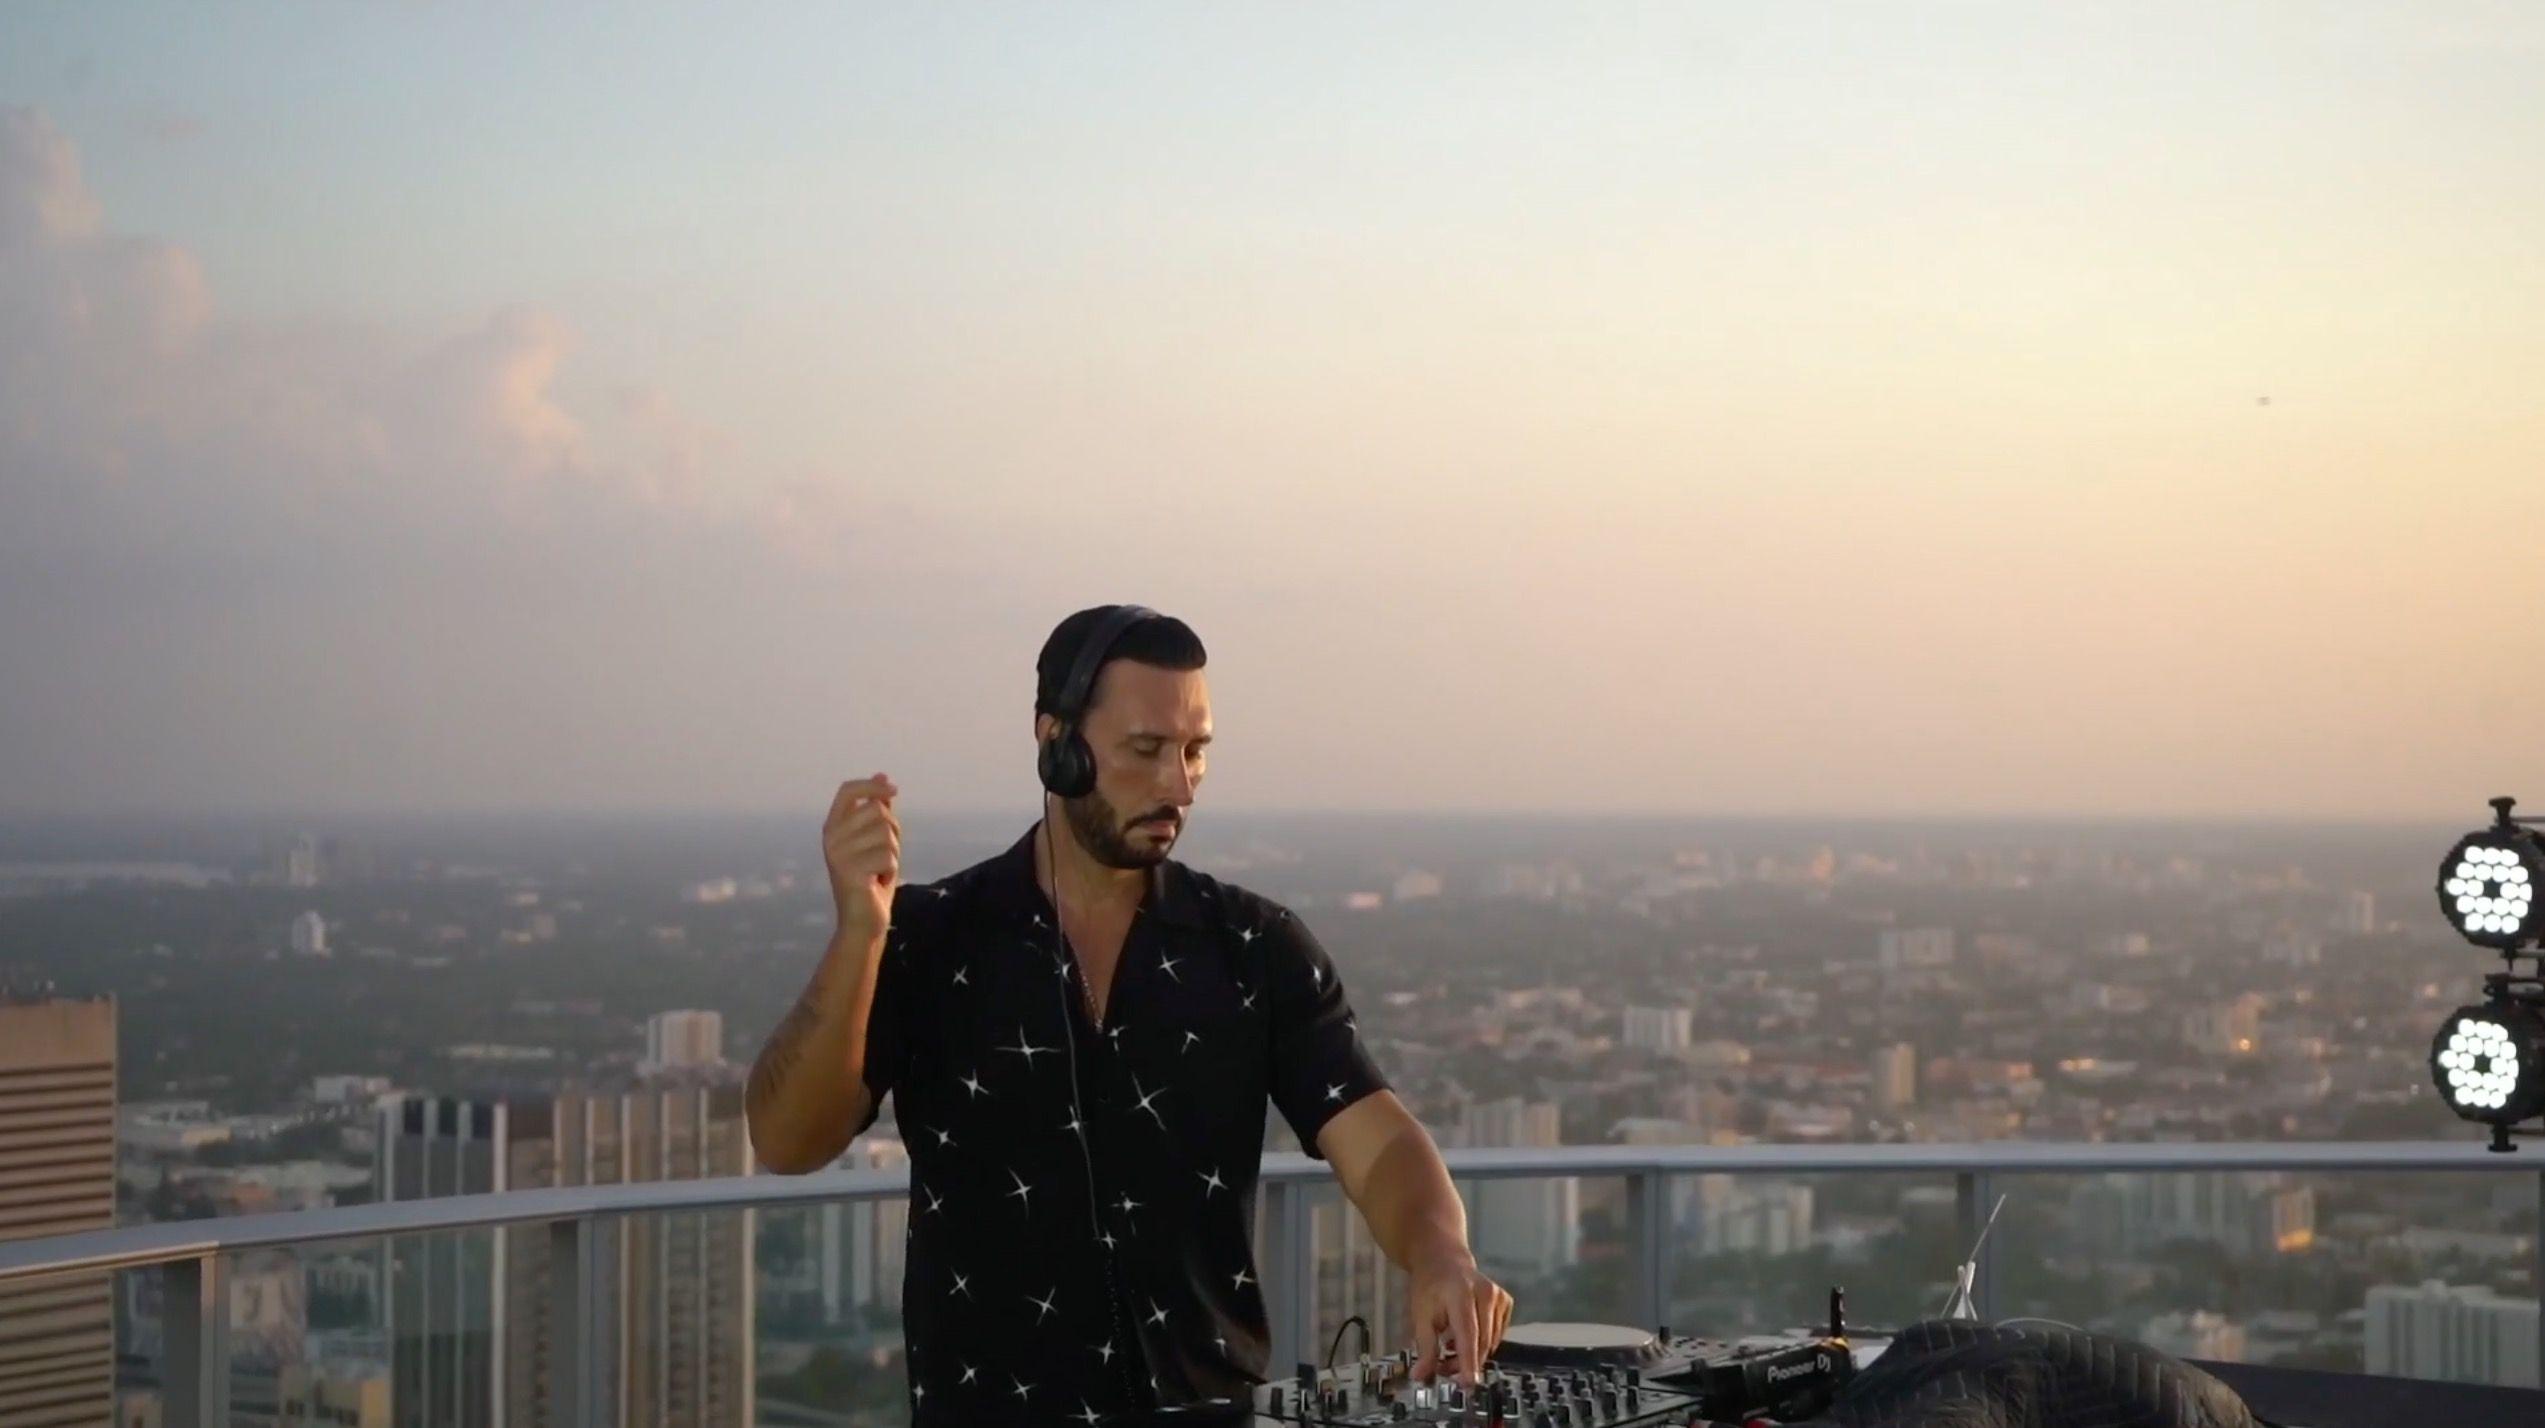 PARAMOUNT Miami Worldcenter - Cedrig Gervais 1